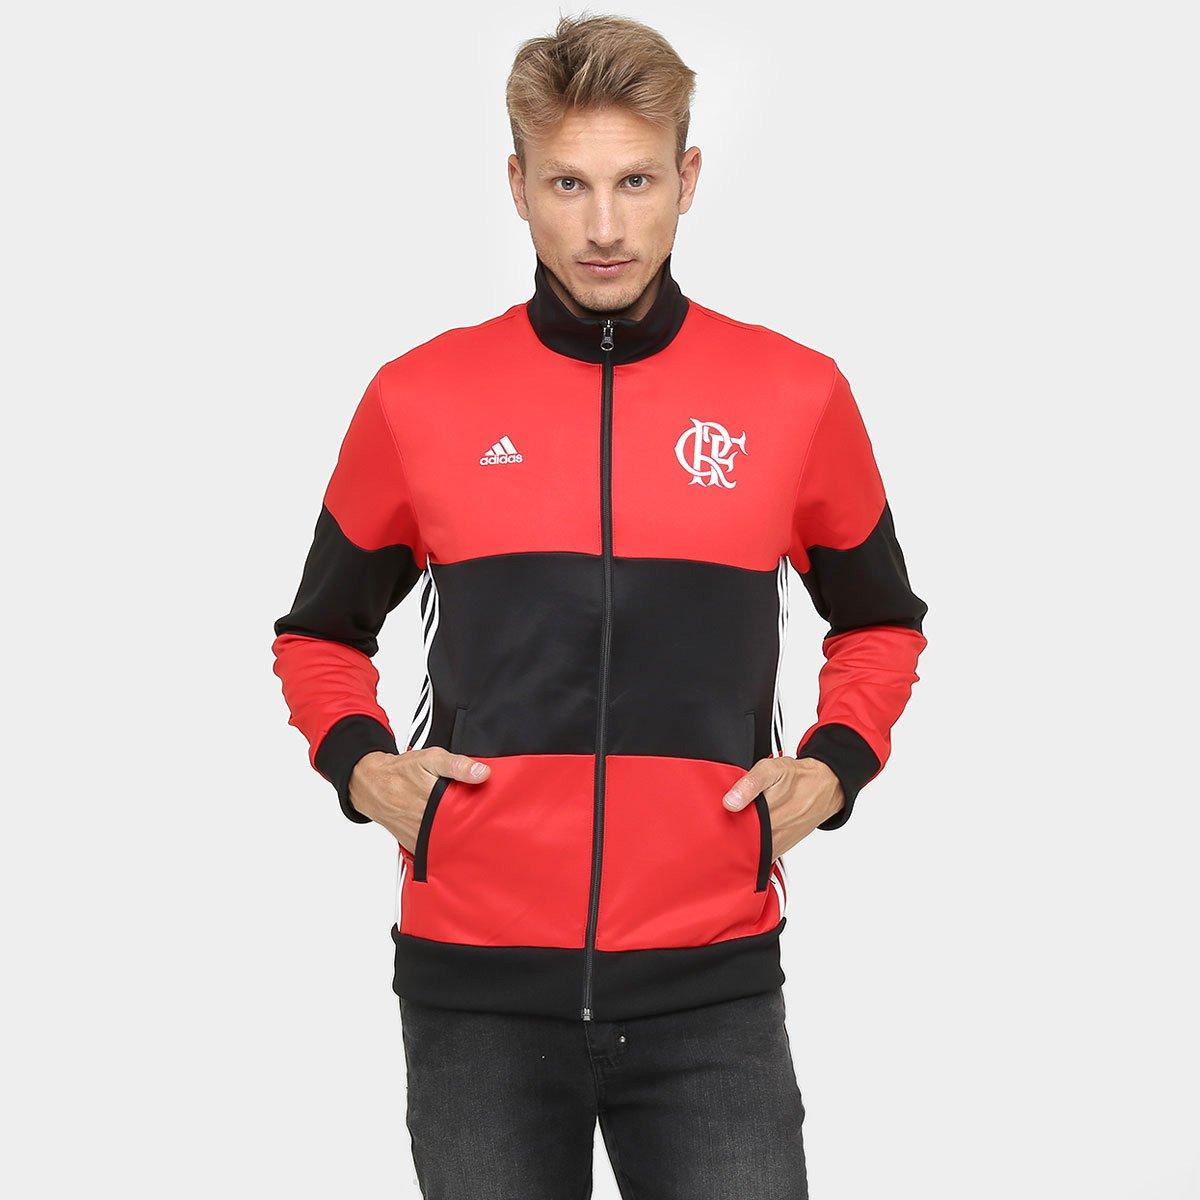 02273f3eb8107 Jaqueta Flamengo Adidas 3S Masculina - Compre Agora